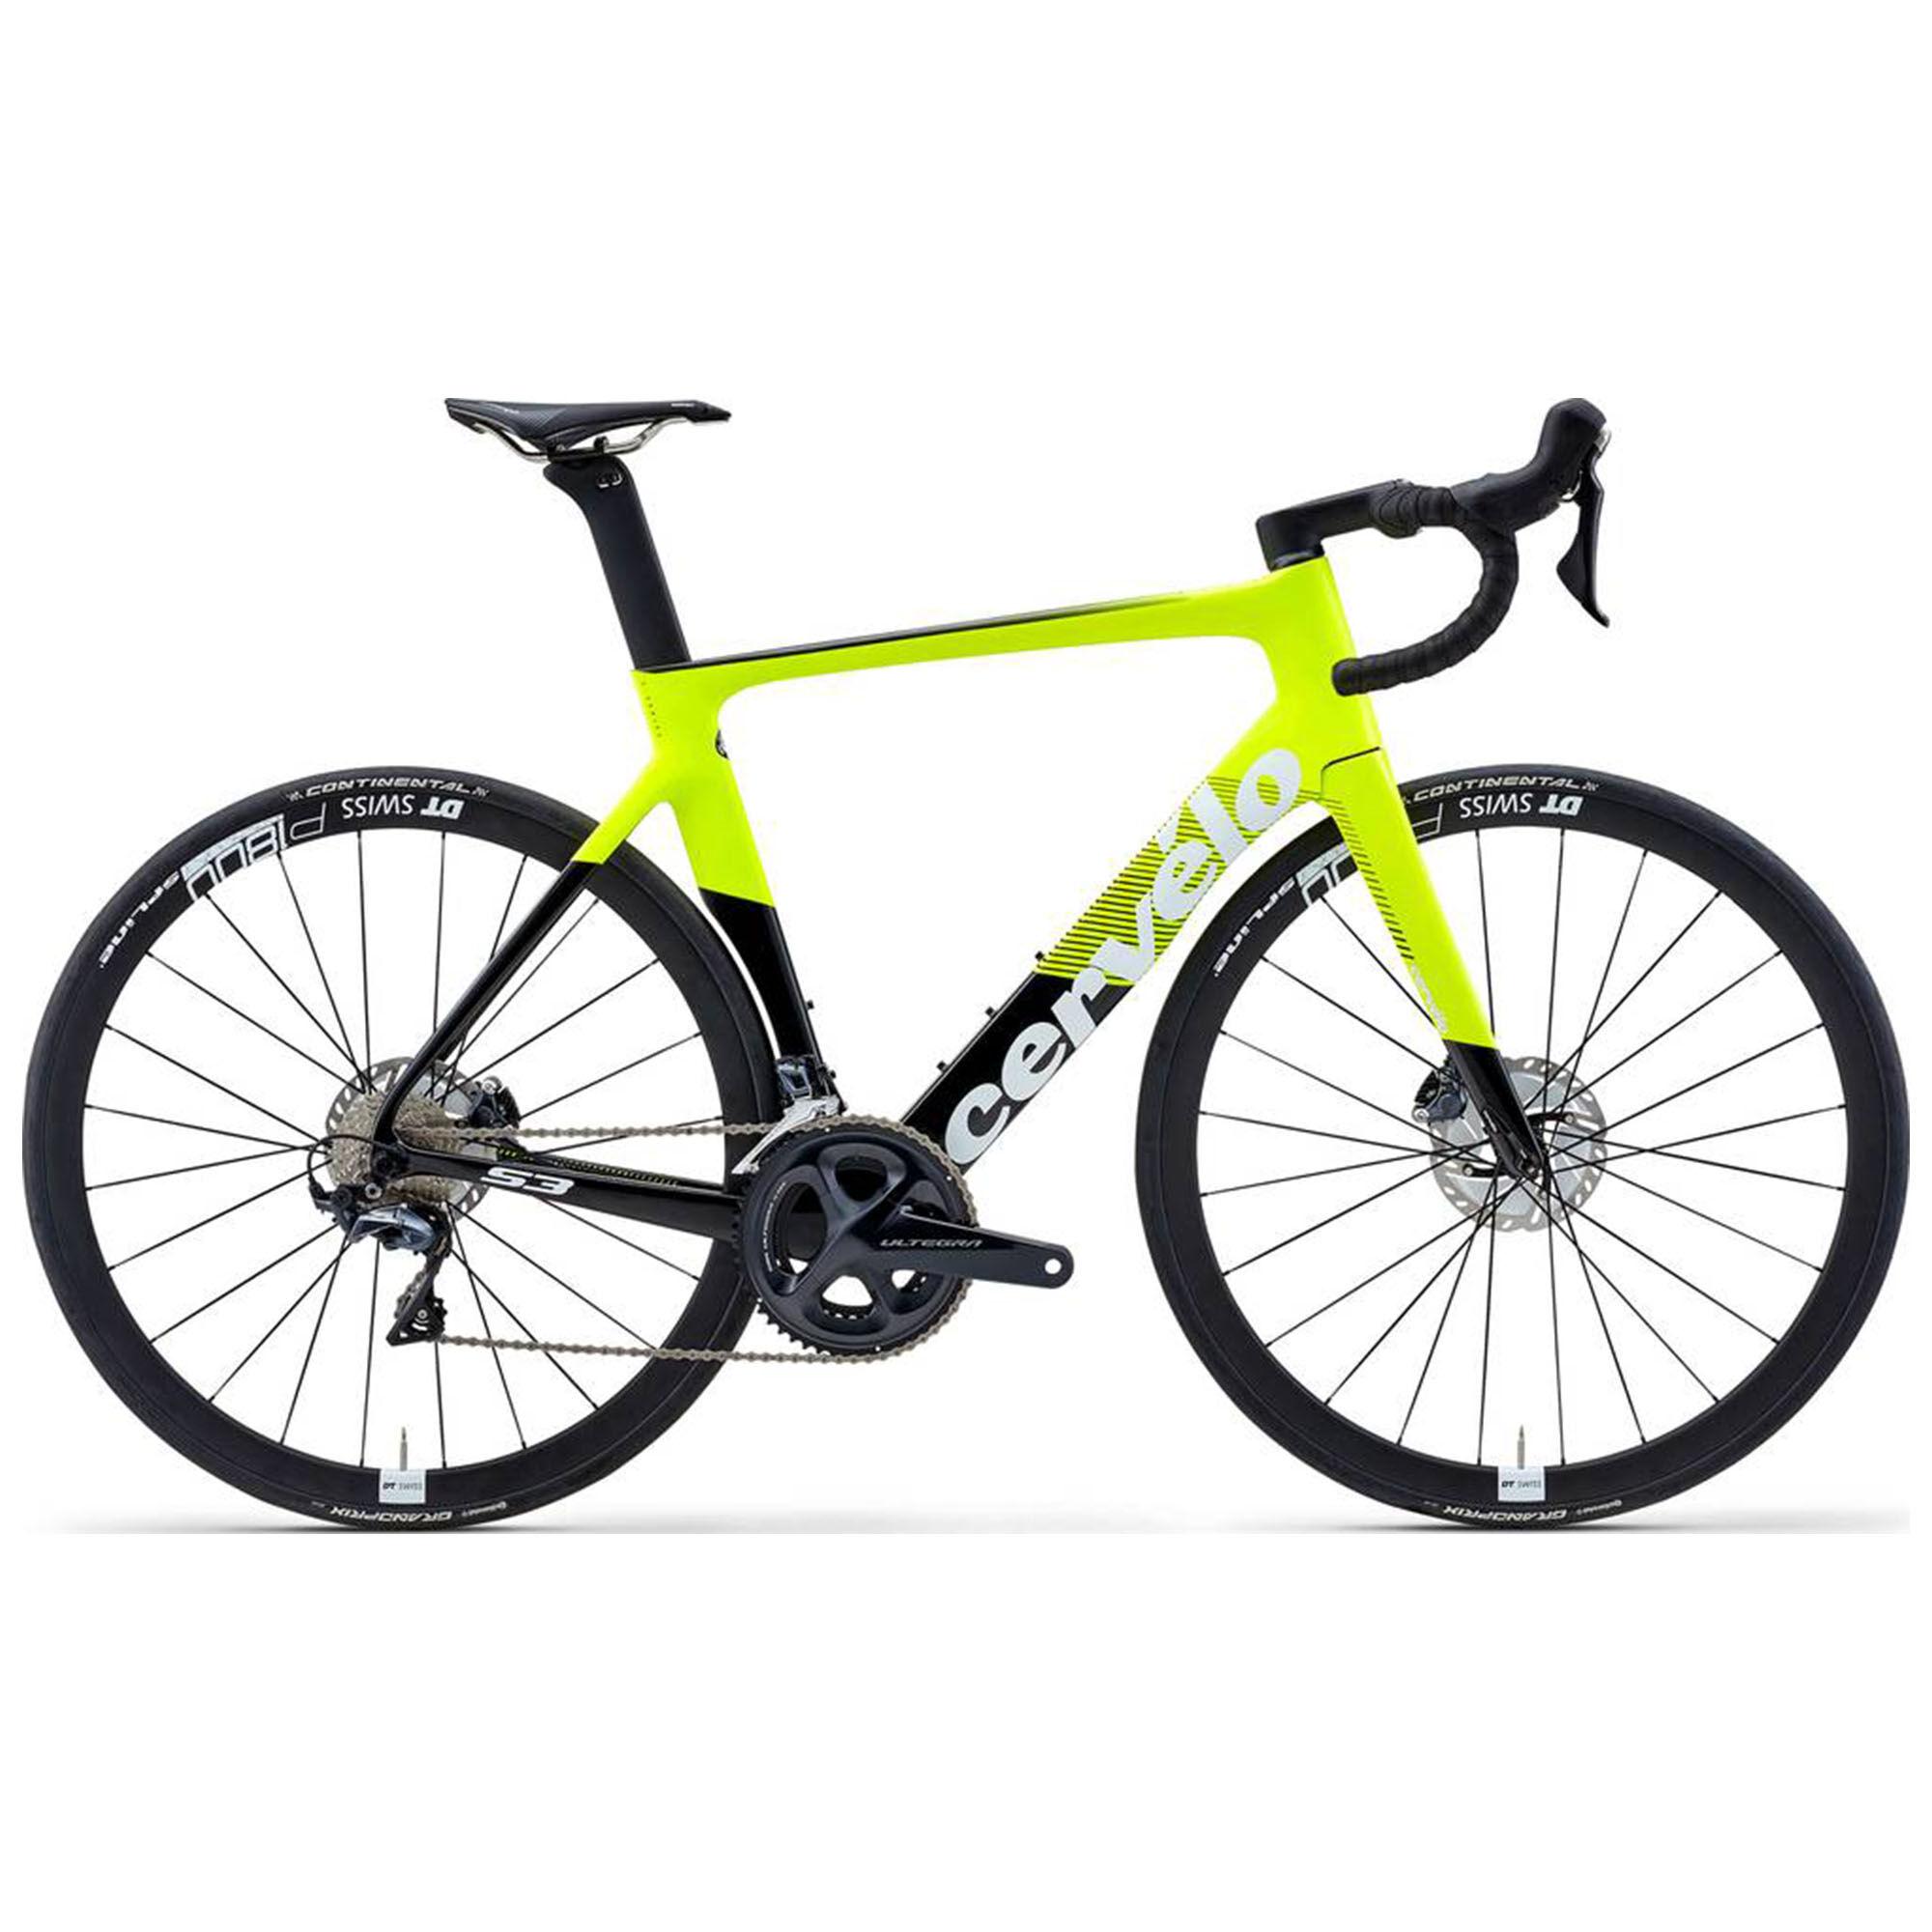 Cervelo Men's S3 Ultegra Disc Road Bike '20  - Yello/Black - Size: 56